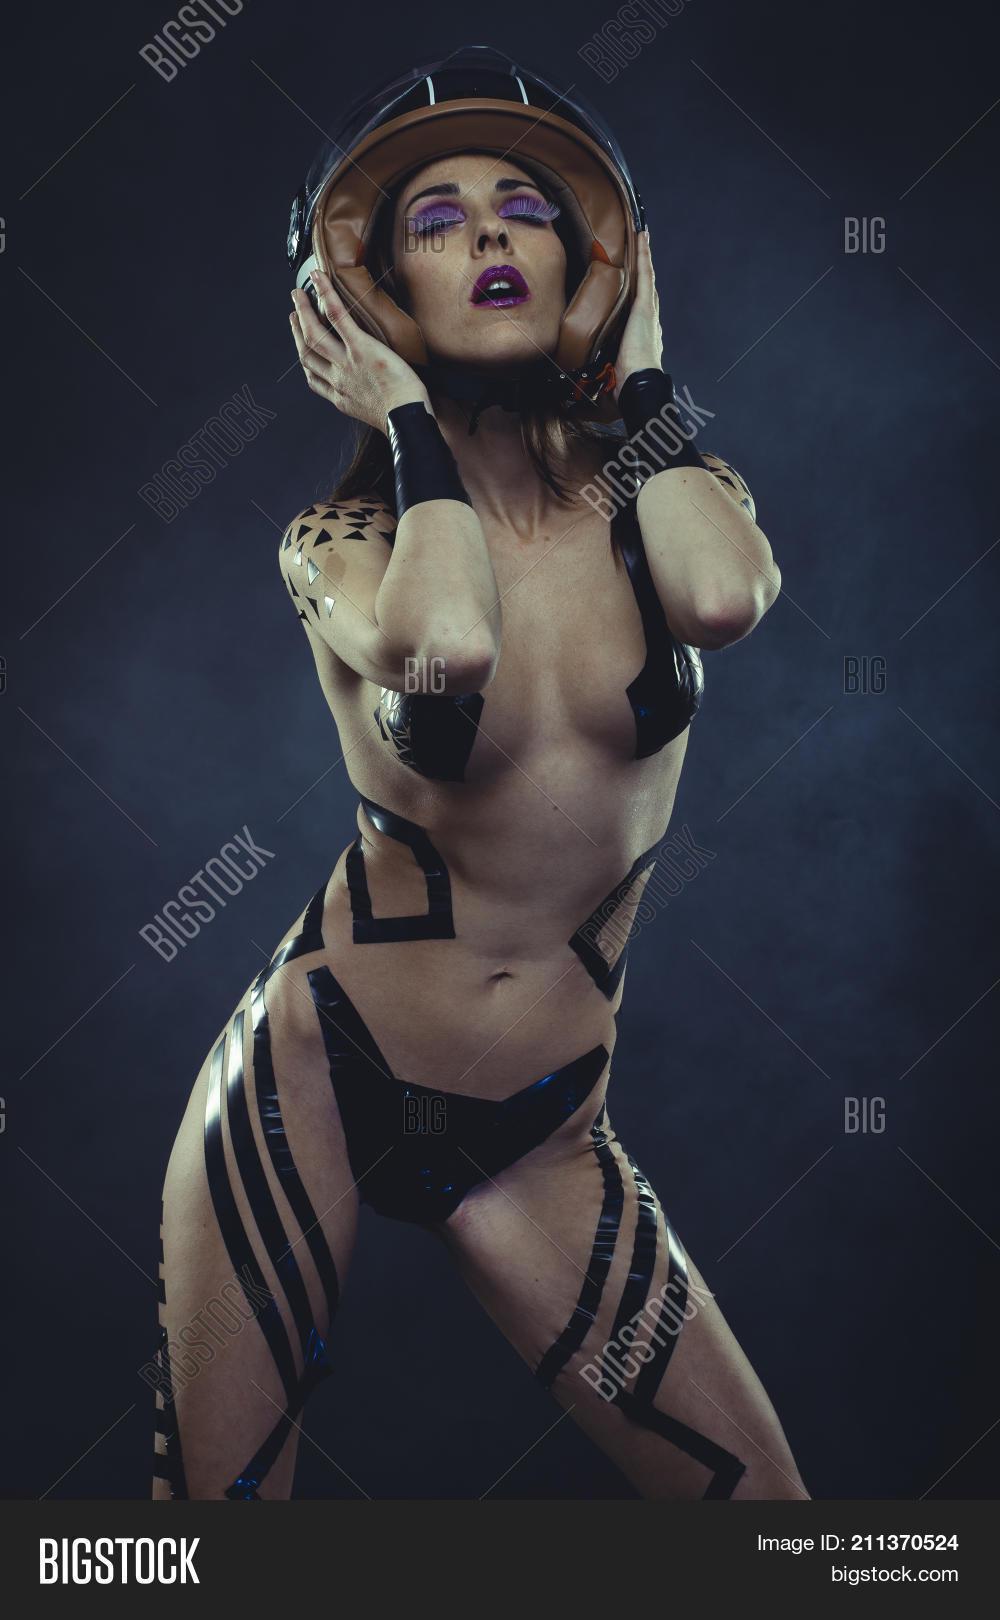 Girl motorcycle Naked